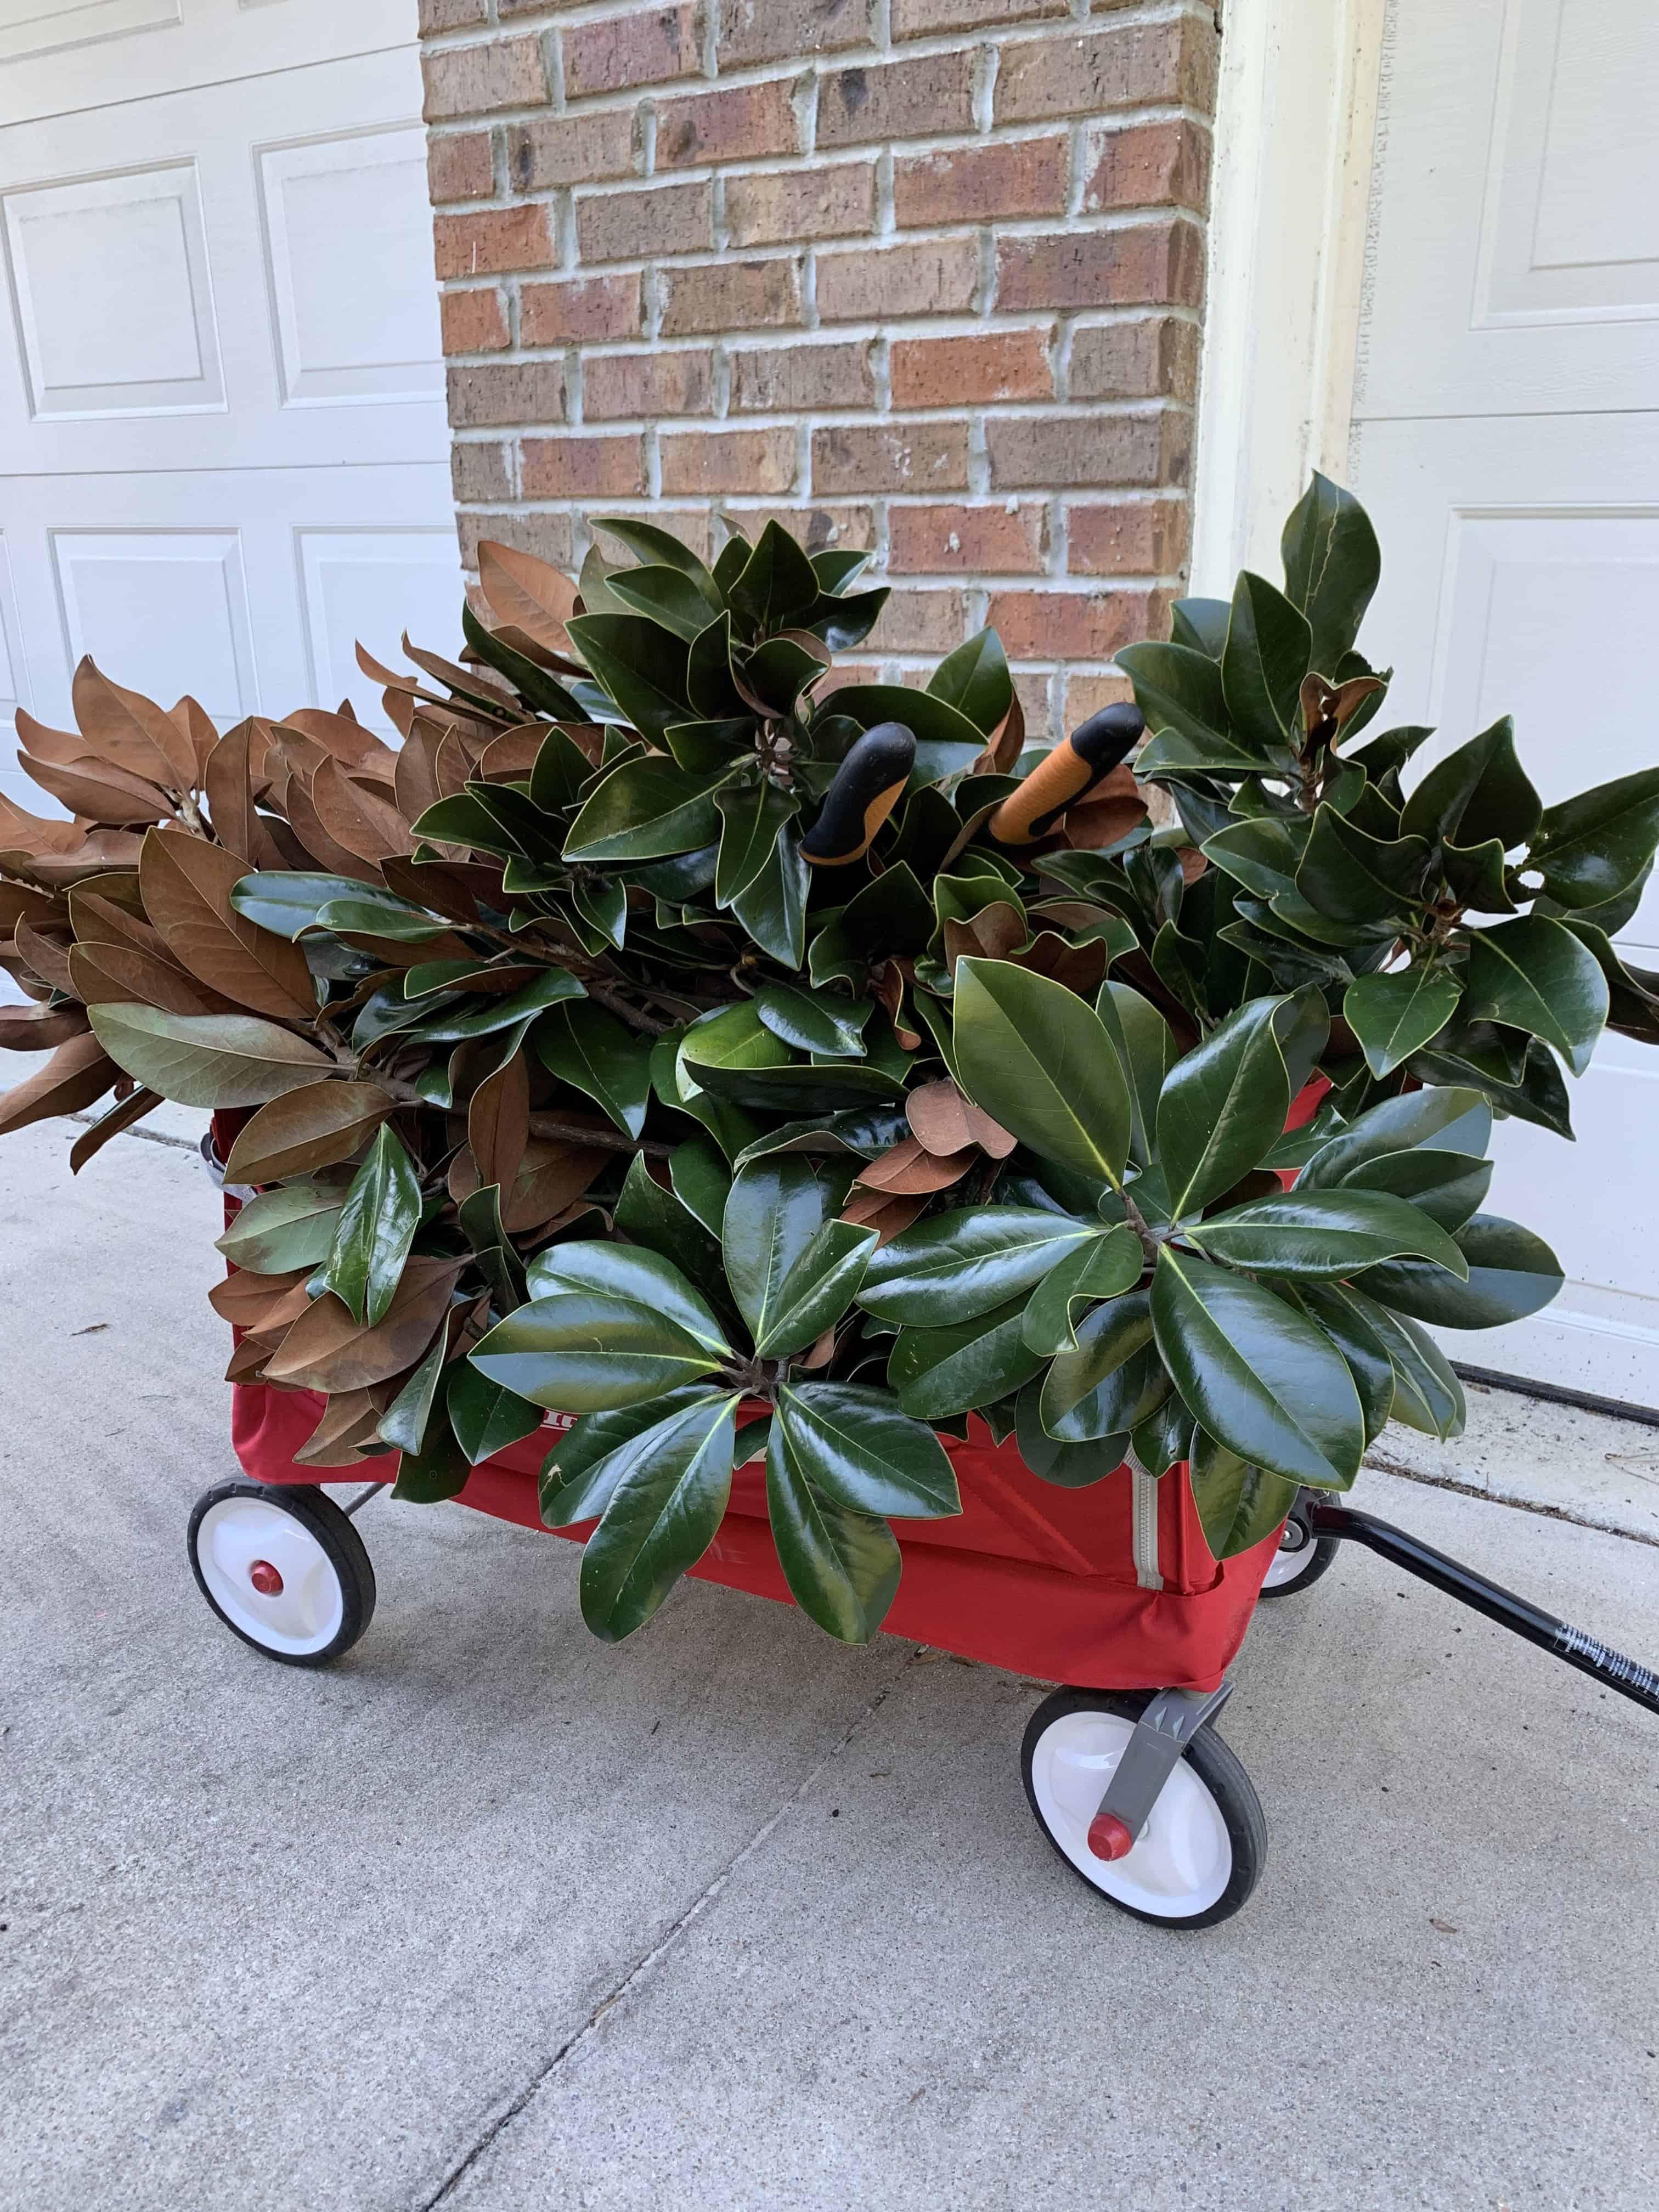 magnolia cuttings in red wagon